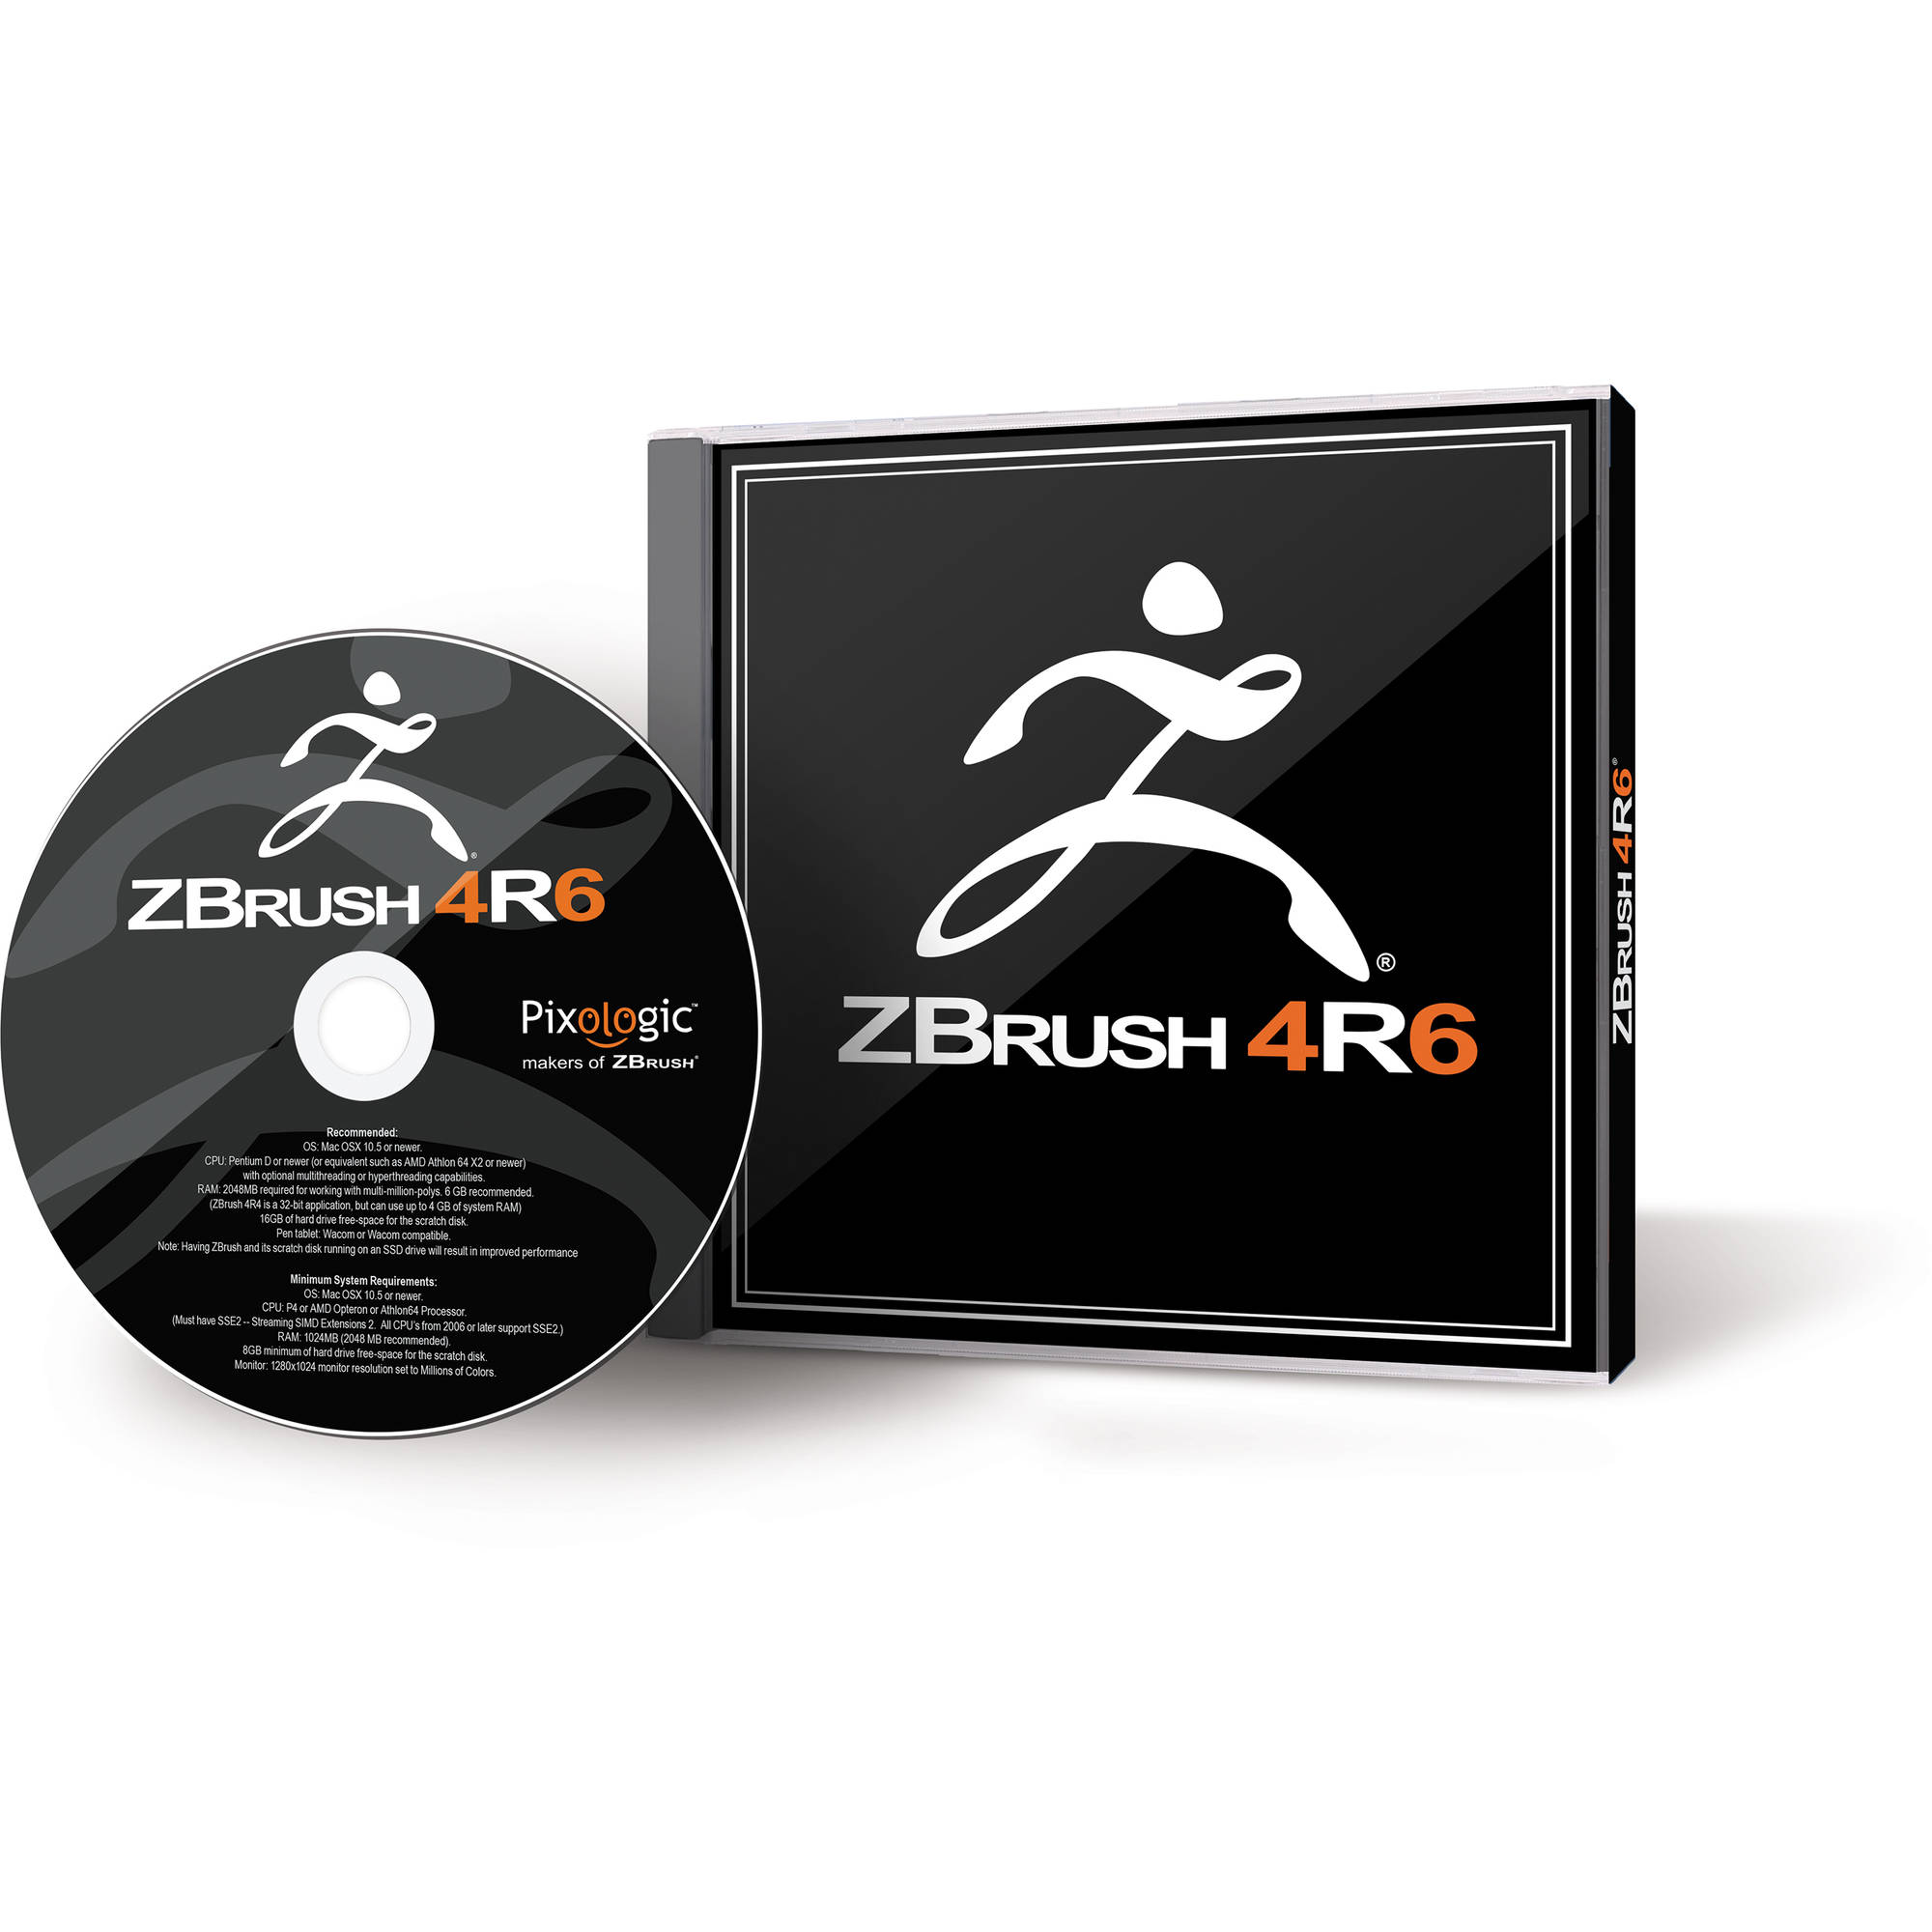 Pixologic ZBrush 4R6 Software for Windows (5-User Serialized License,  Download)